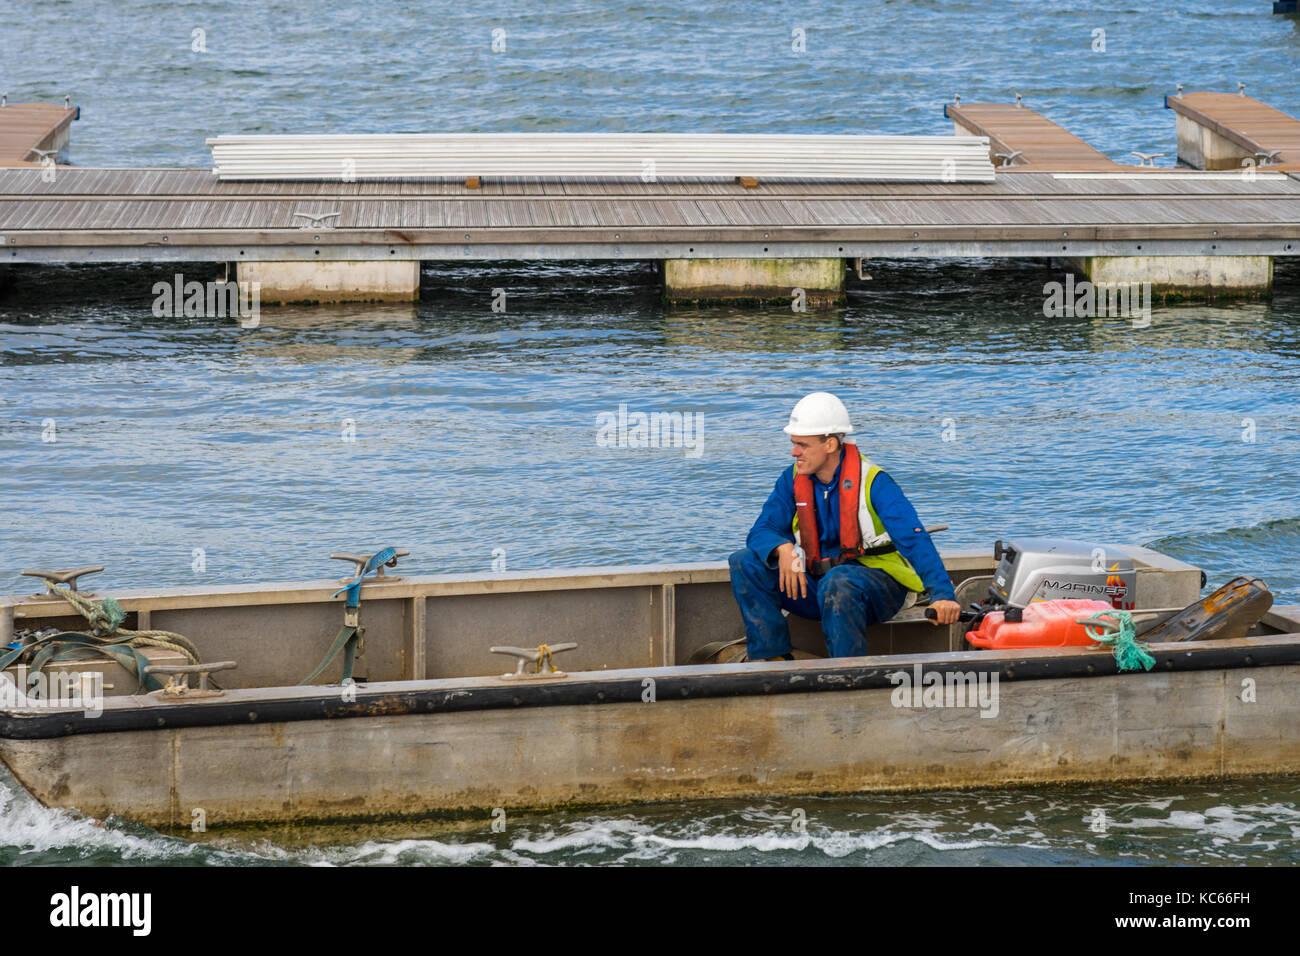 ABP (Associated British Ports) member of staff at work at Southampton Docks, Southampton, UK - Stock Image